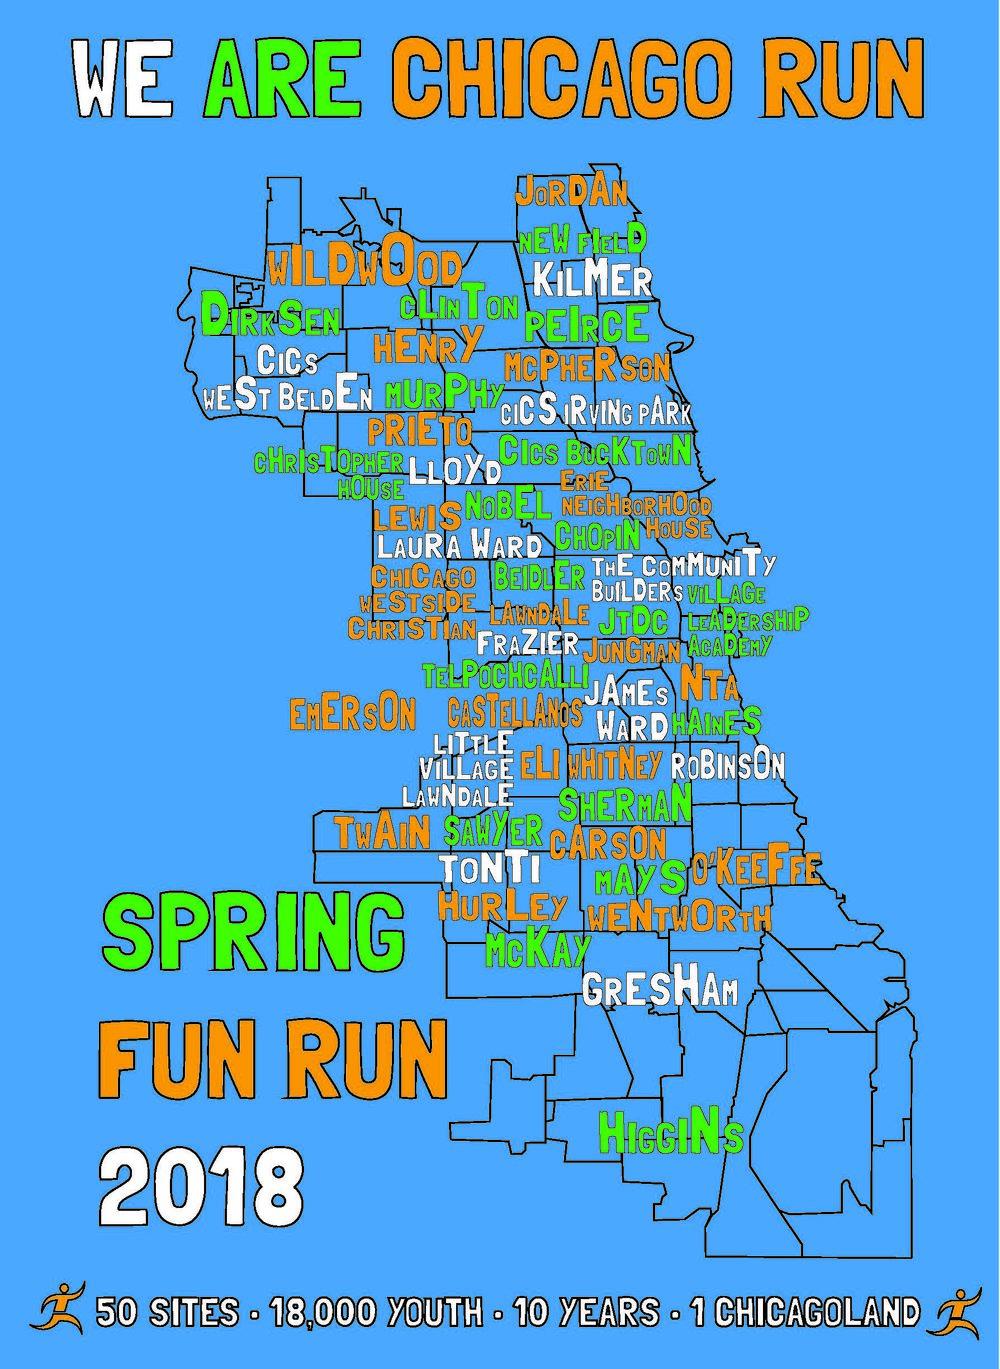 2018 Spring Fun Run T-Shirt